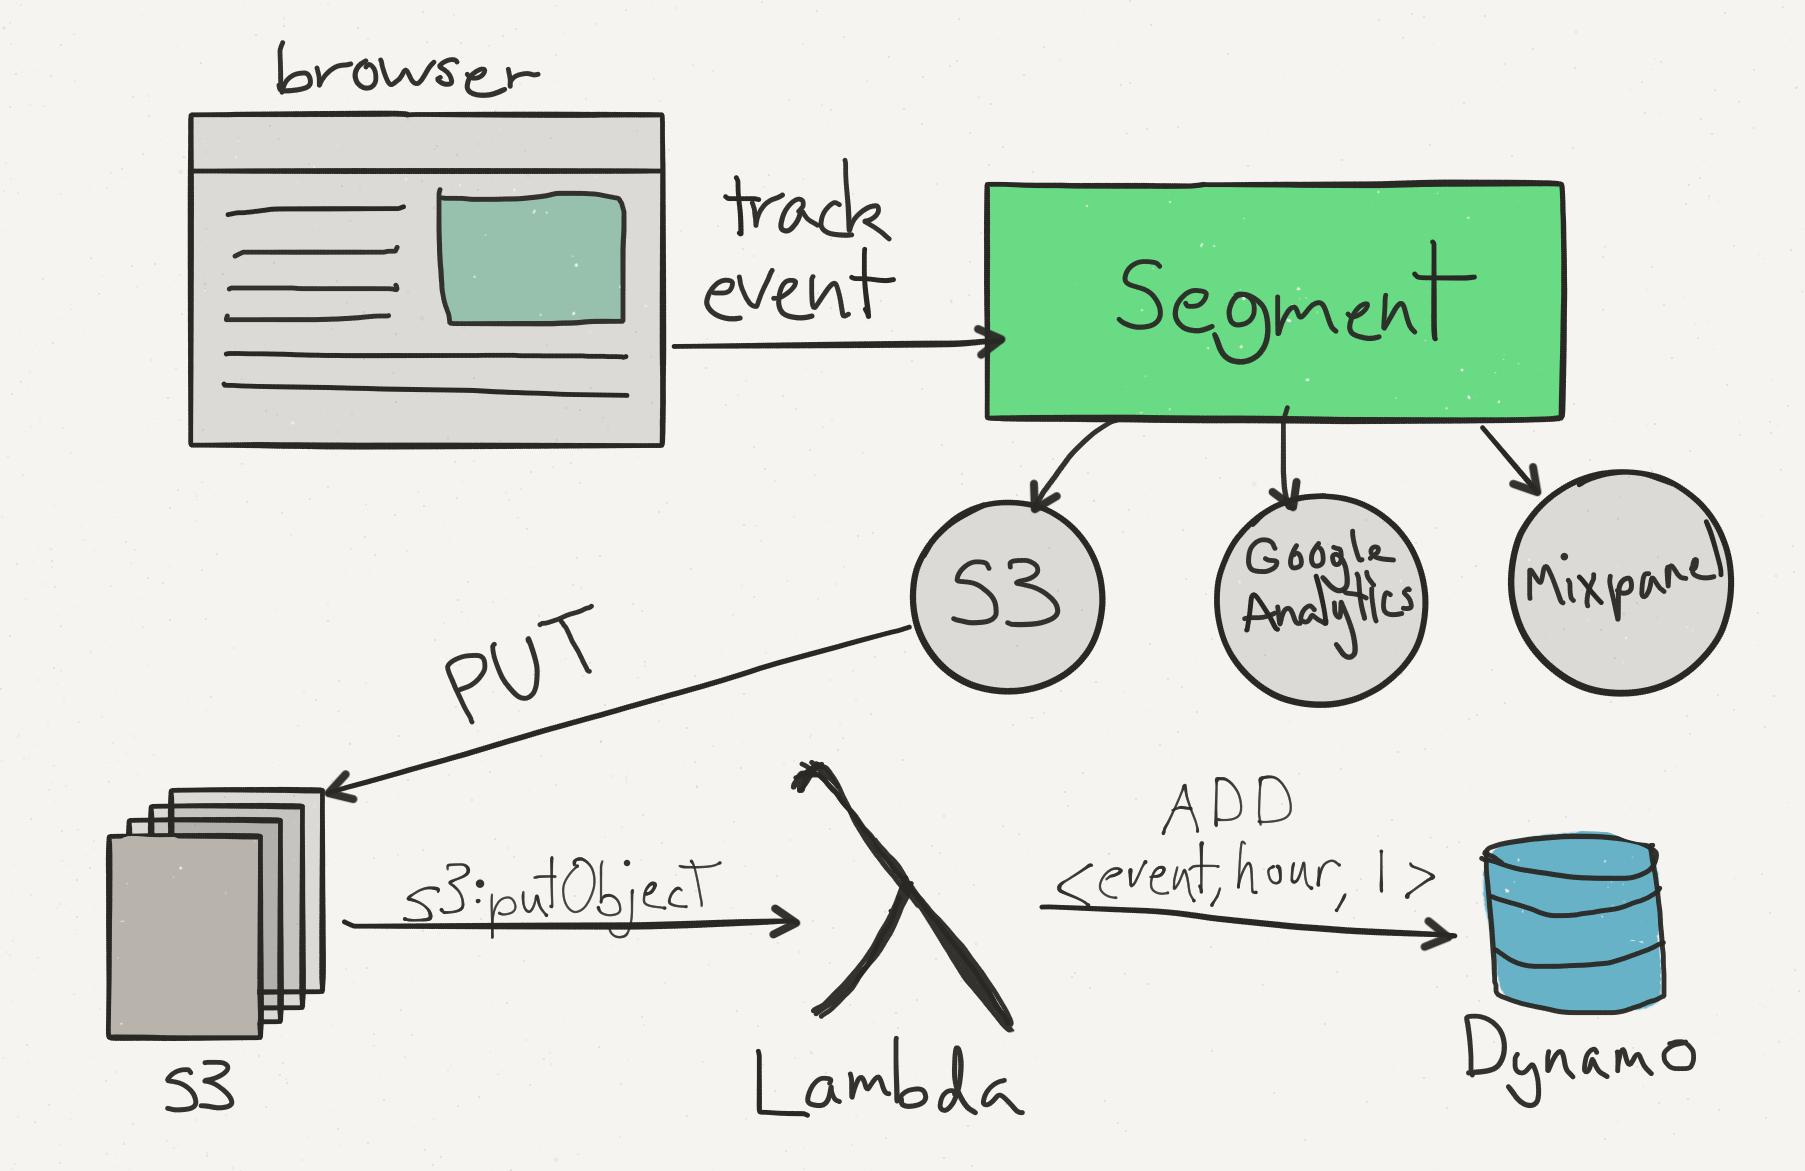 The Totally Managed Analytics Pipeline: Segment, Lambda, and Dynamo